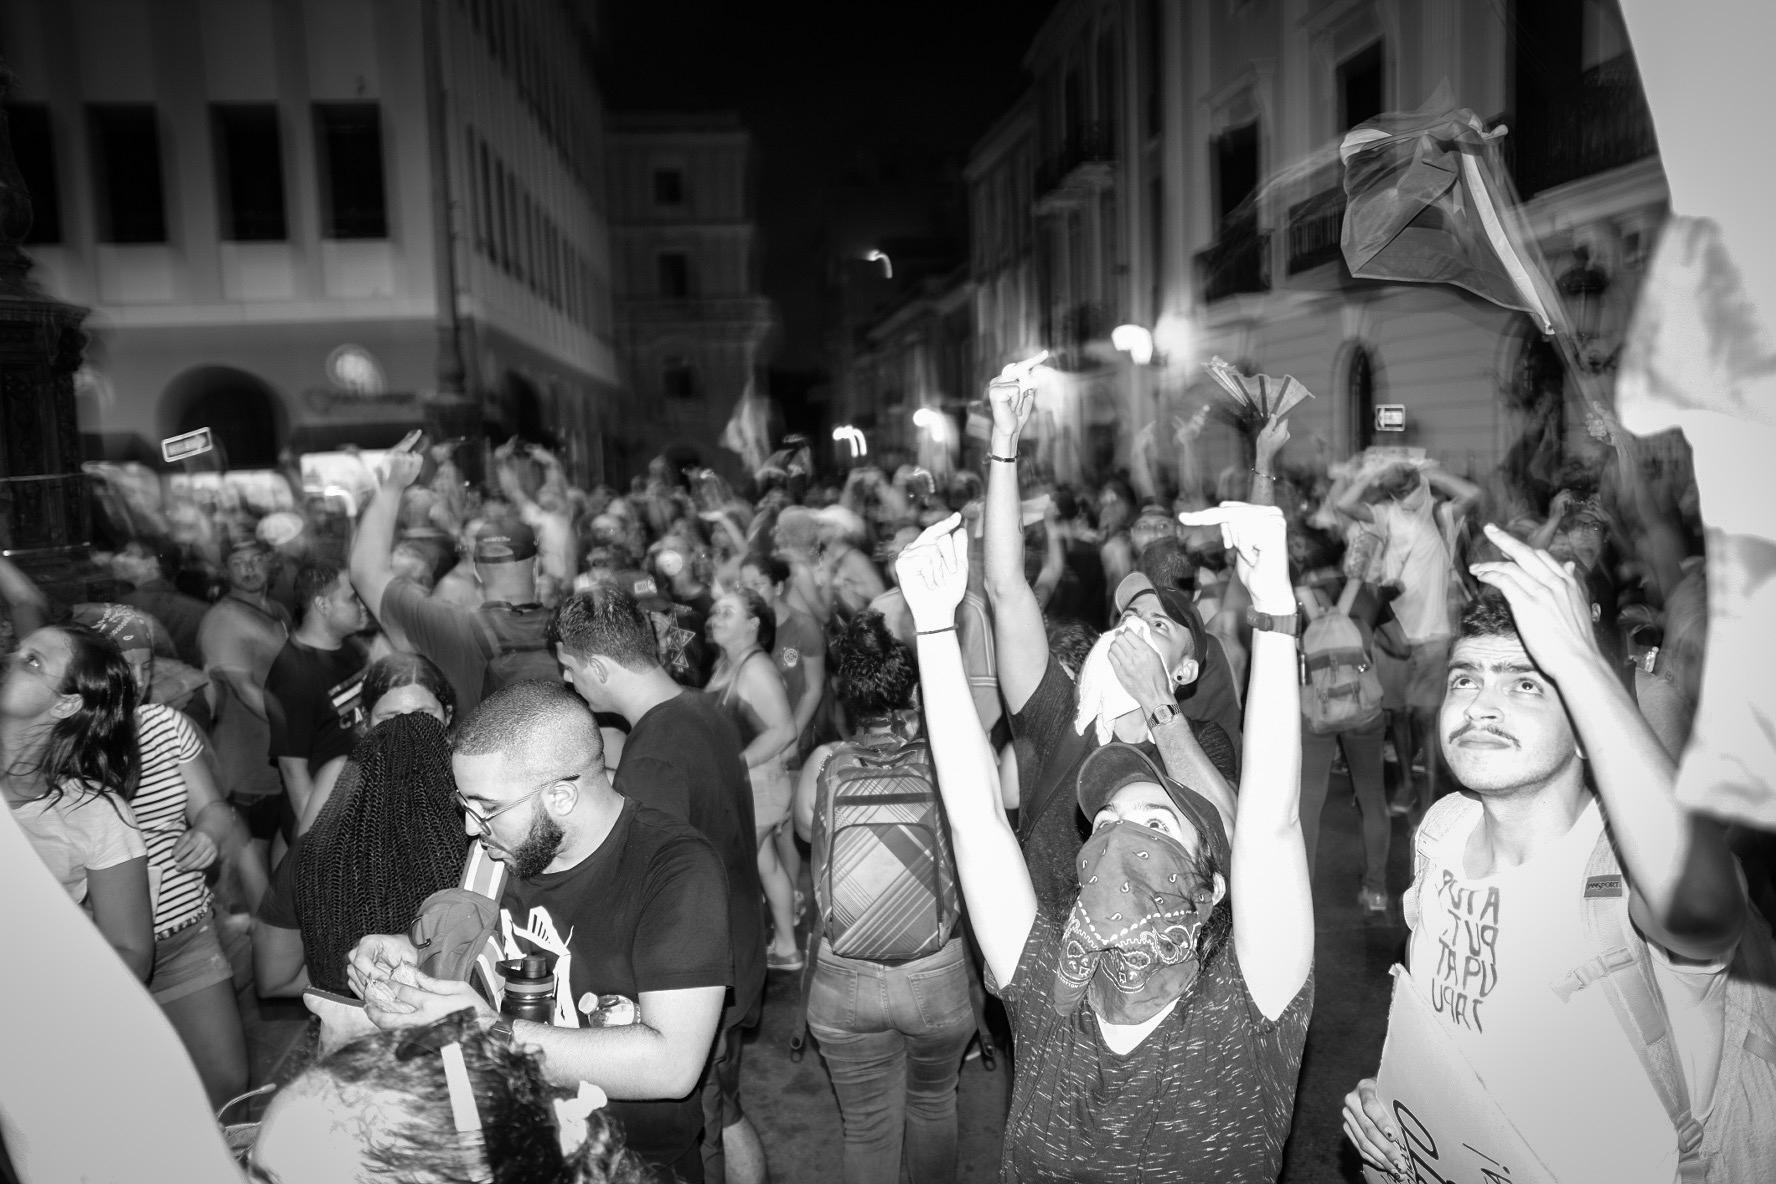 Protest against the Governor of Puerto Rico demanding his resignation. 7/15/19 San Juan, PR.